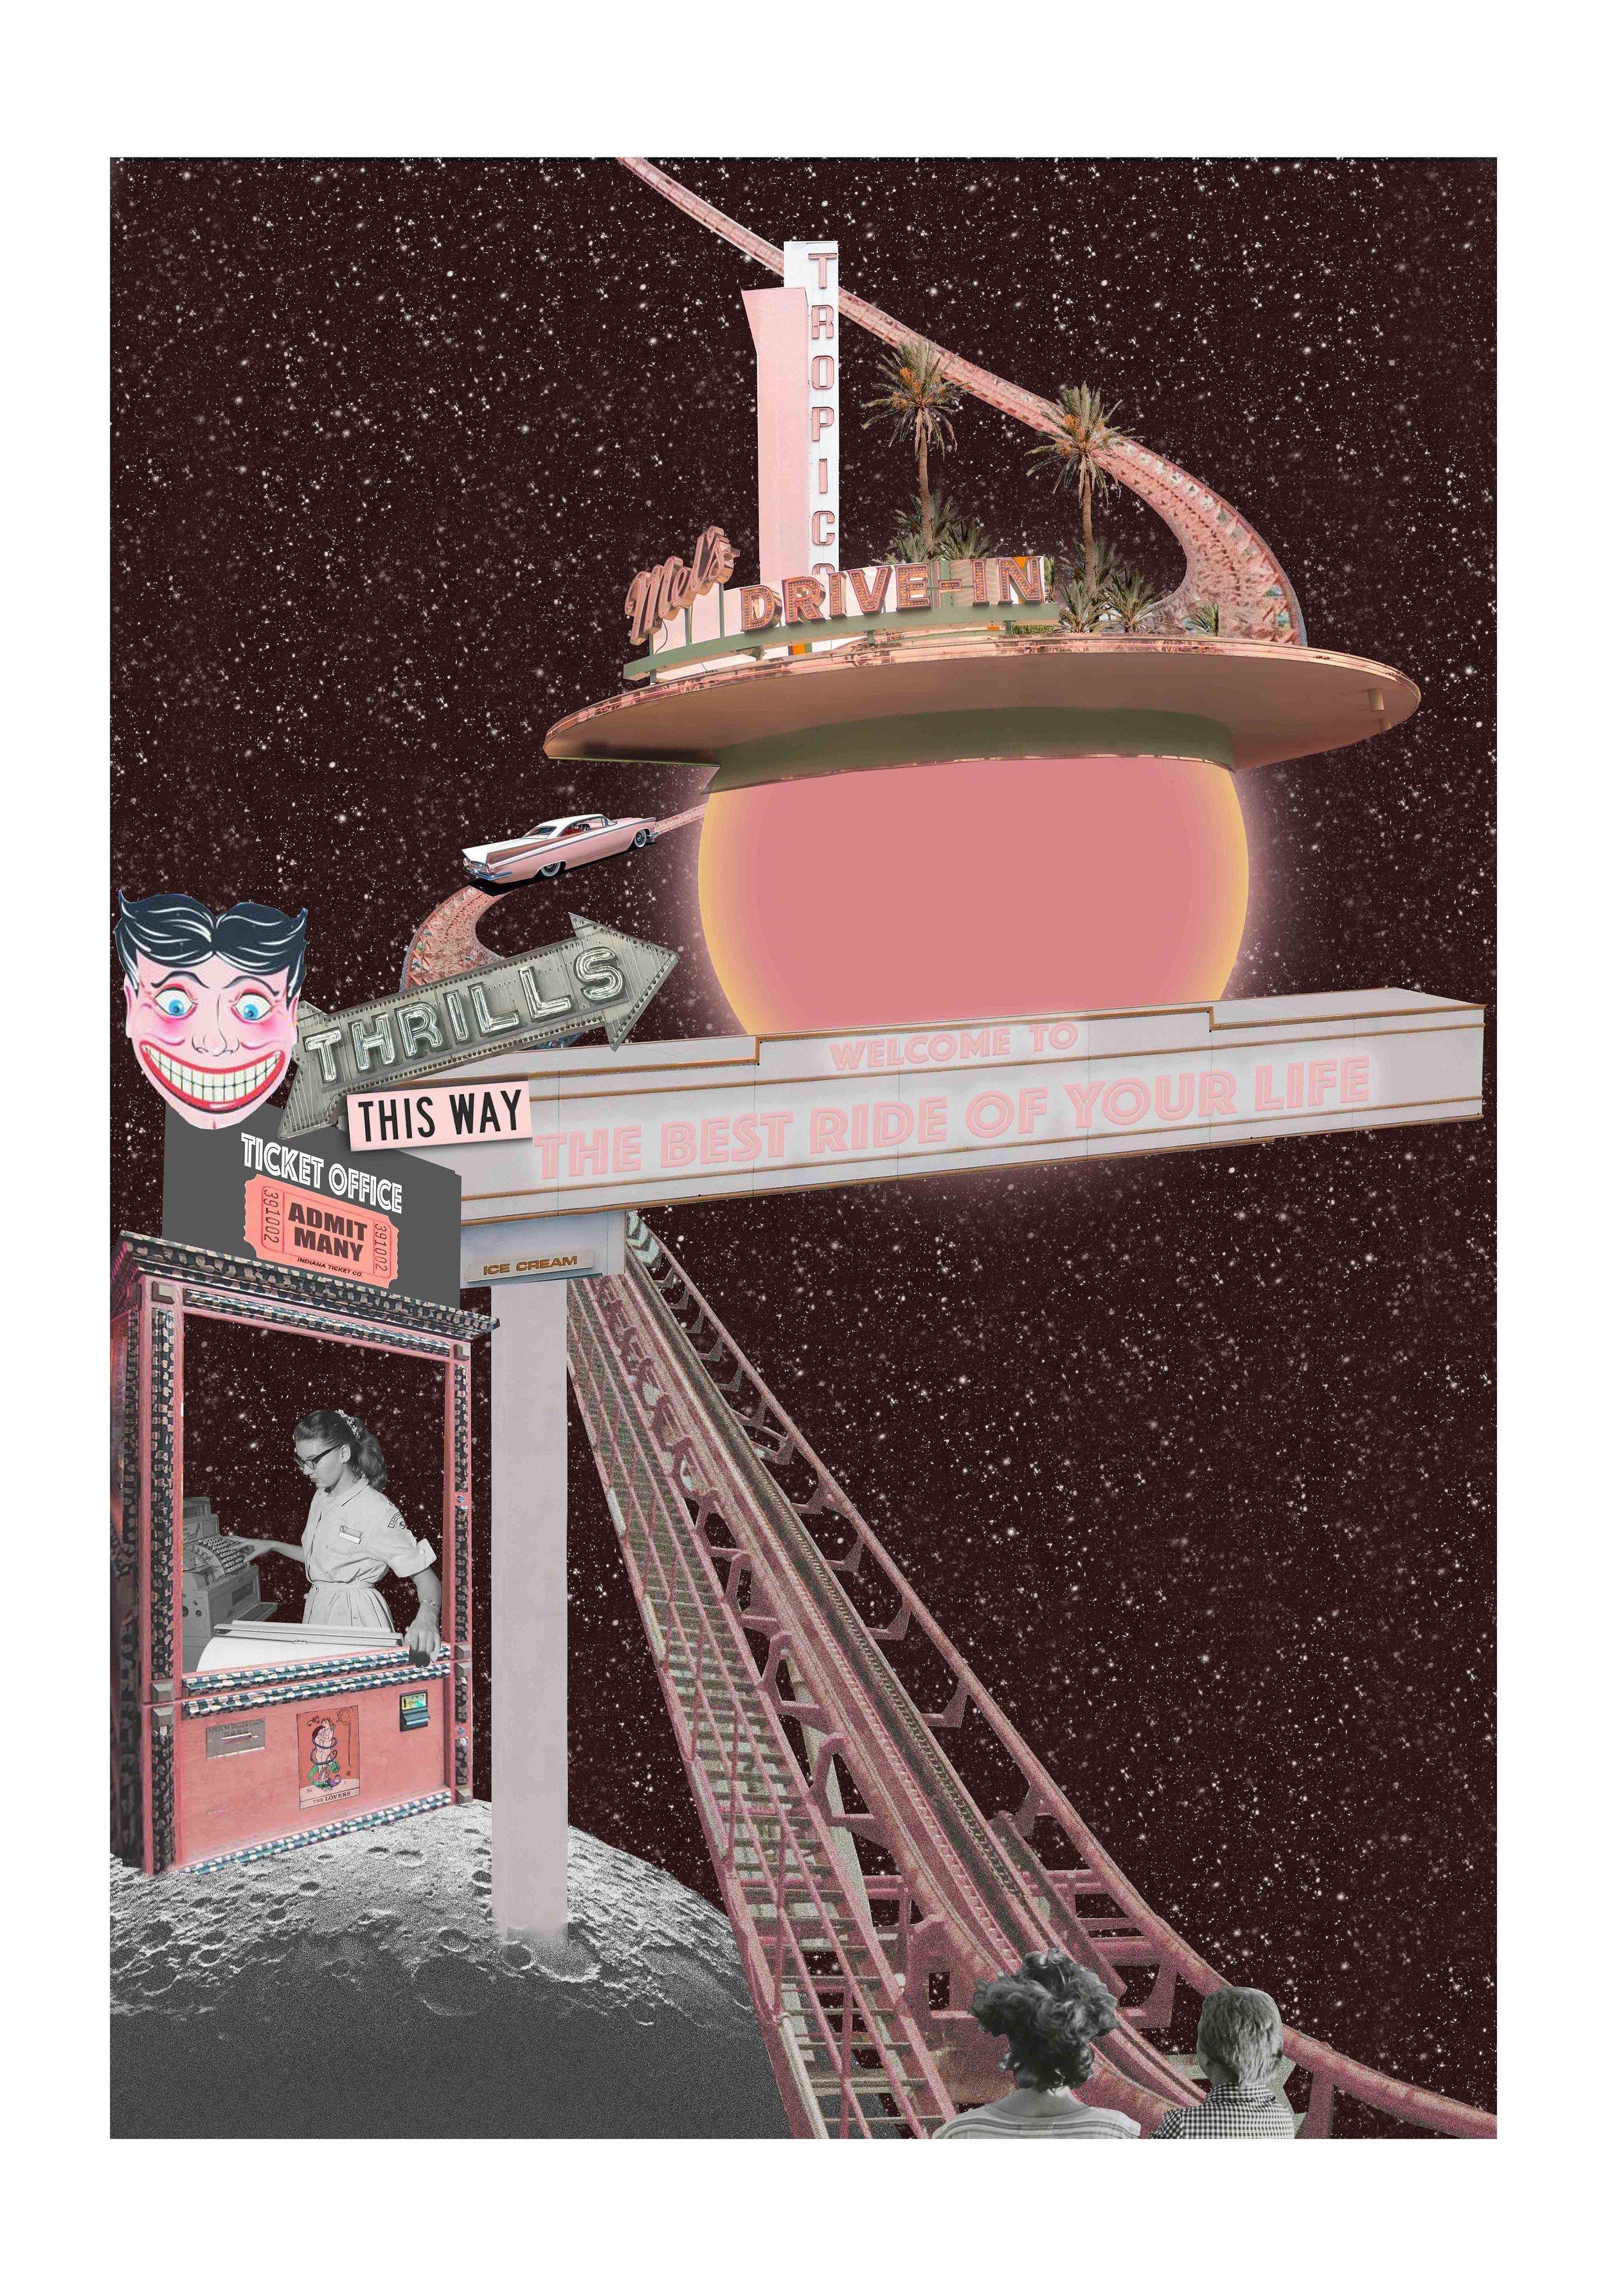 best ride of your life_fei alexeli_100 x 70 cm.jpg